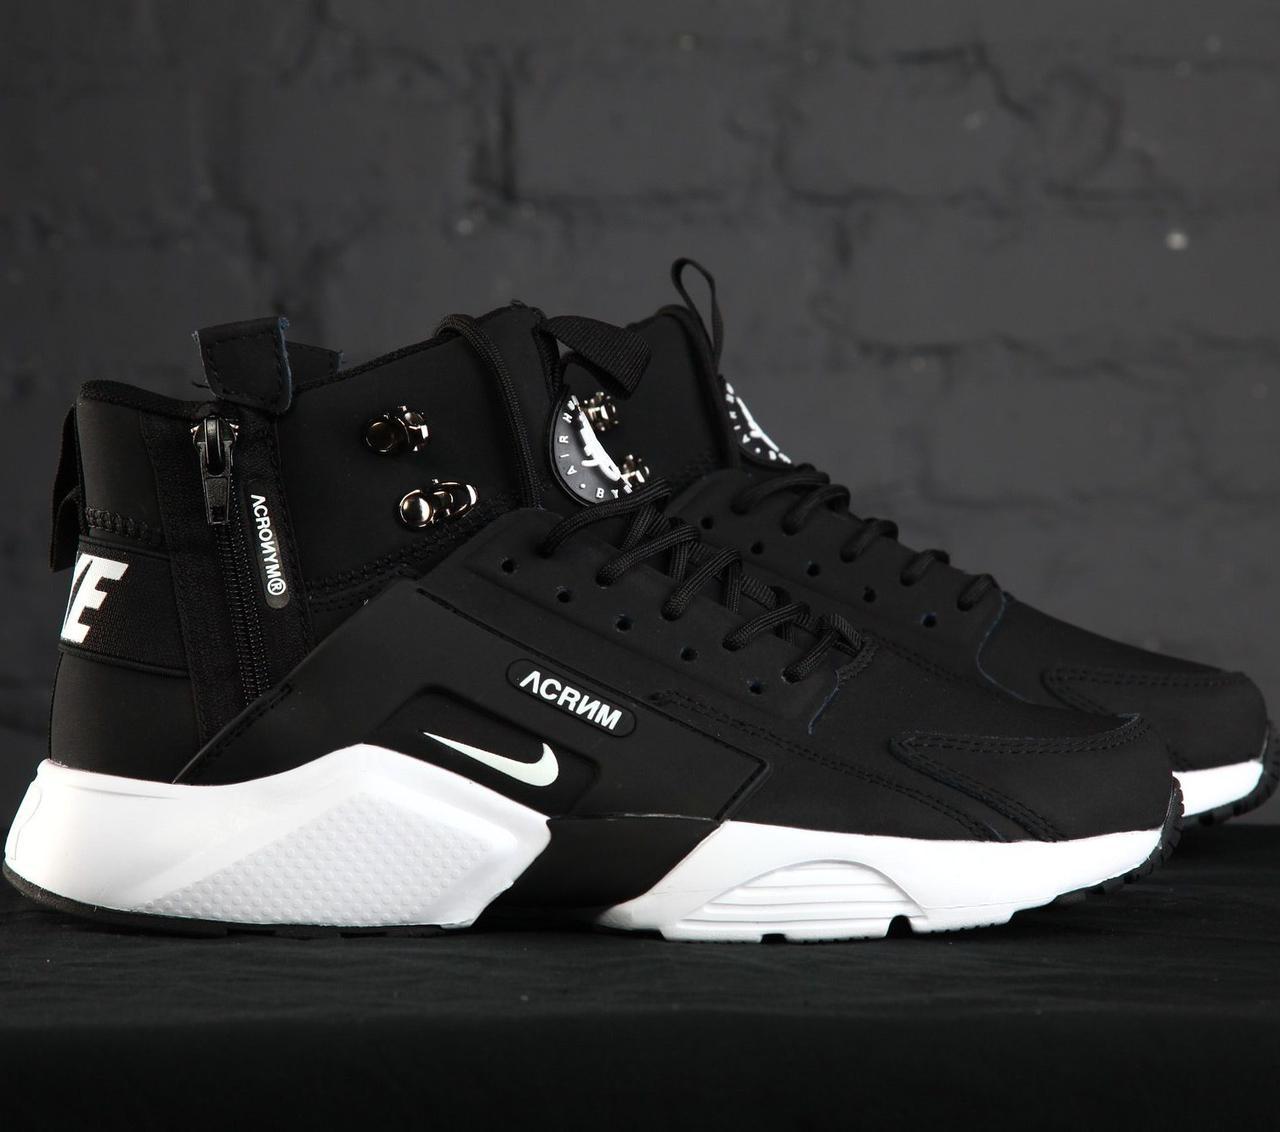 50ebdc12c88c Мужские Кроссовки Nike Huarache Acronym Concept Black White — в ...